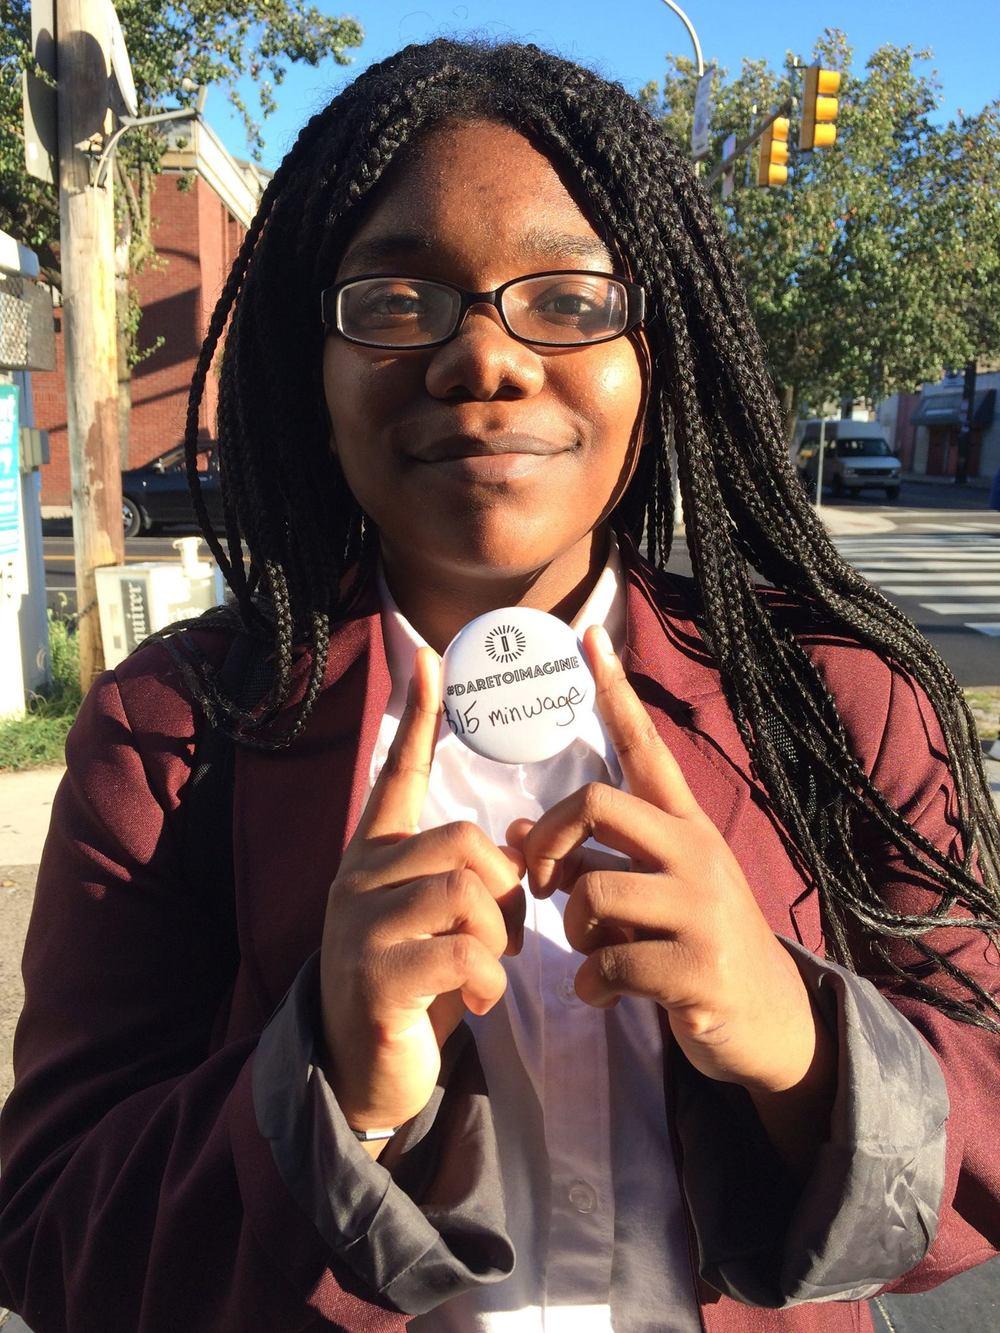 DareToImagine button maker at Germantown Imagination Station at Greene Street and Chelten Avenue.(Photo by Yolanda Wisher, October 2016)